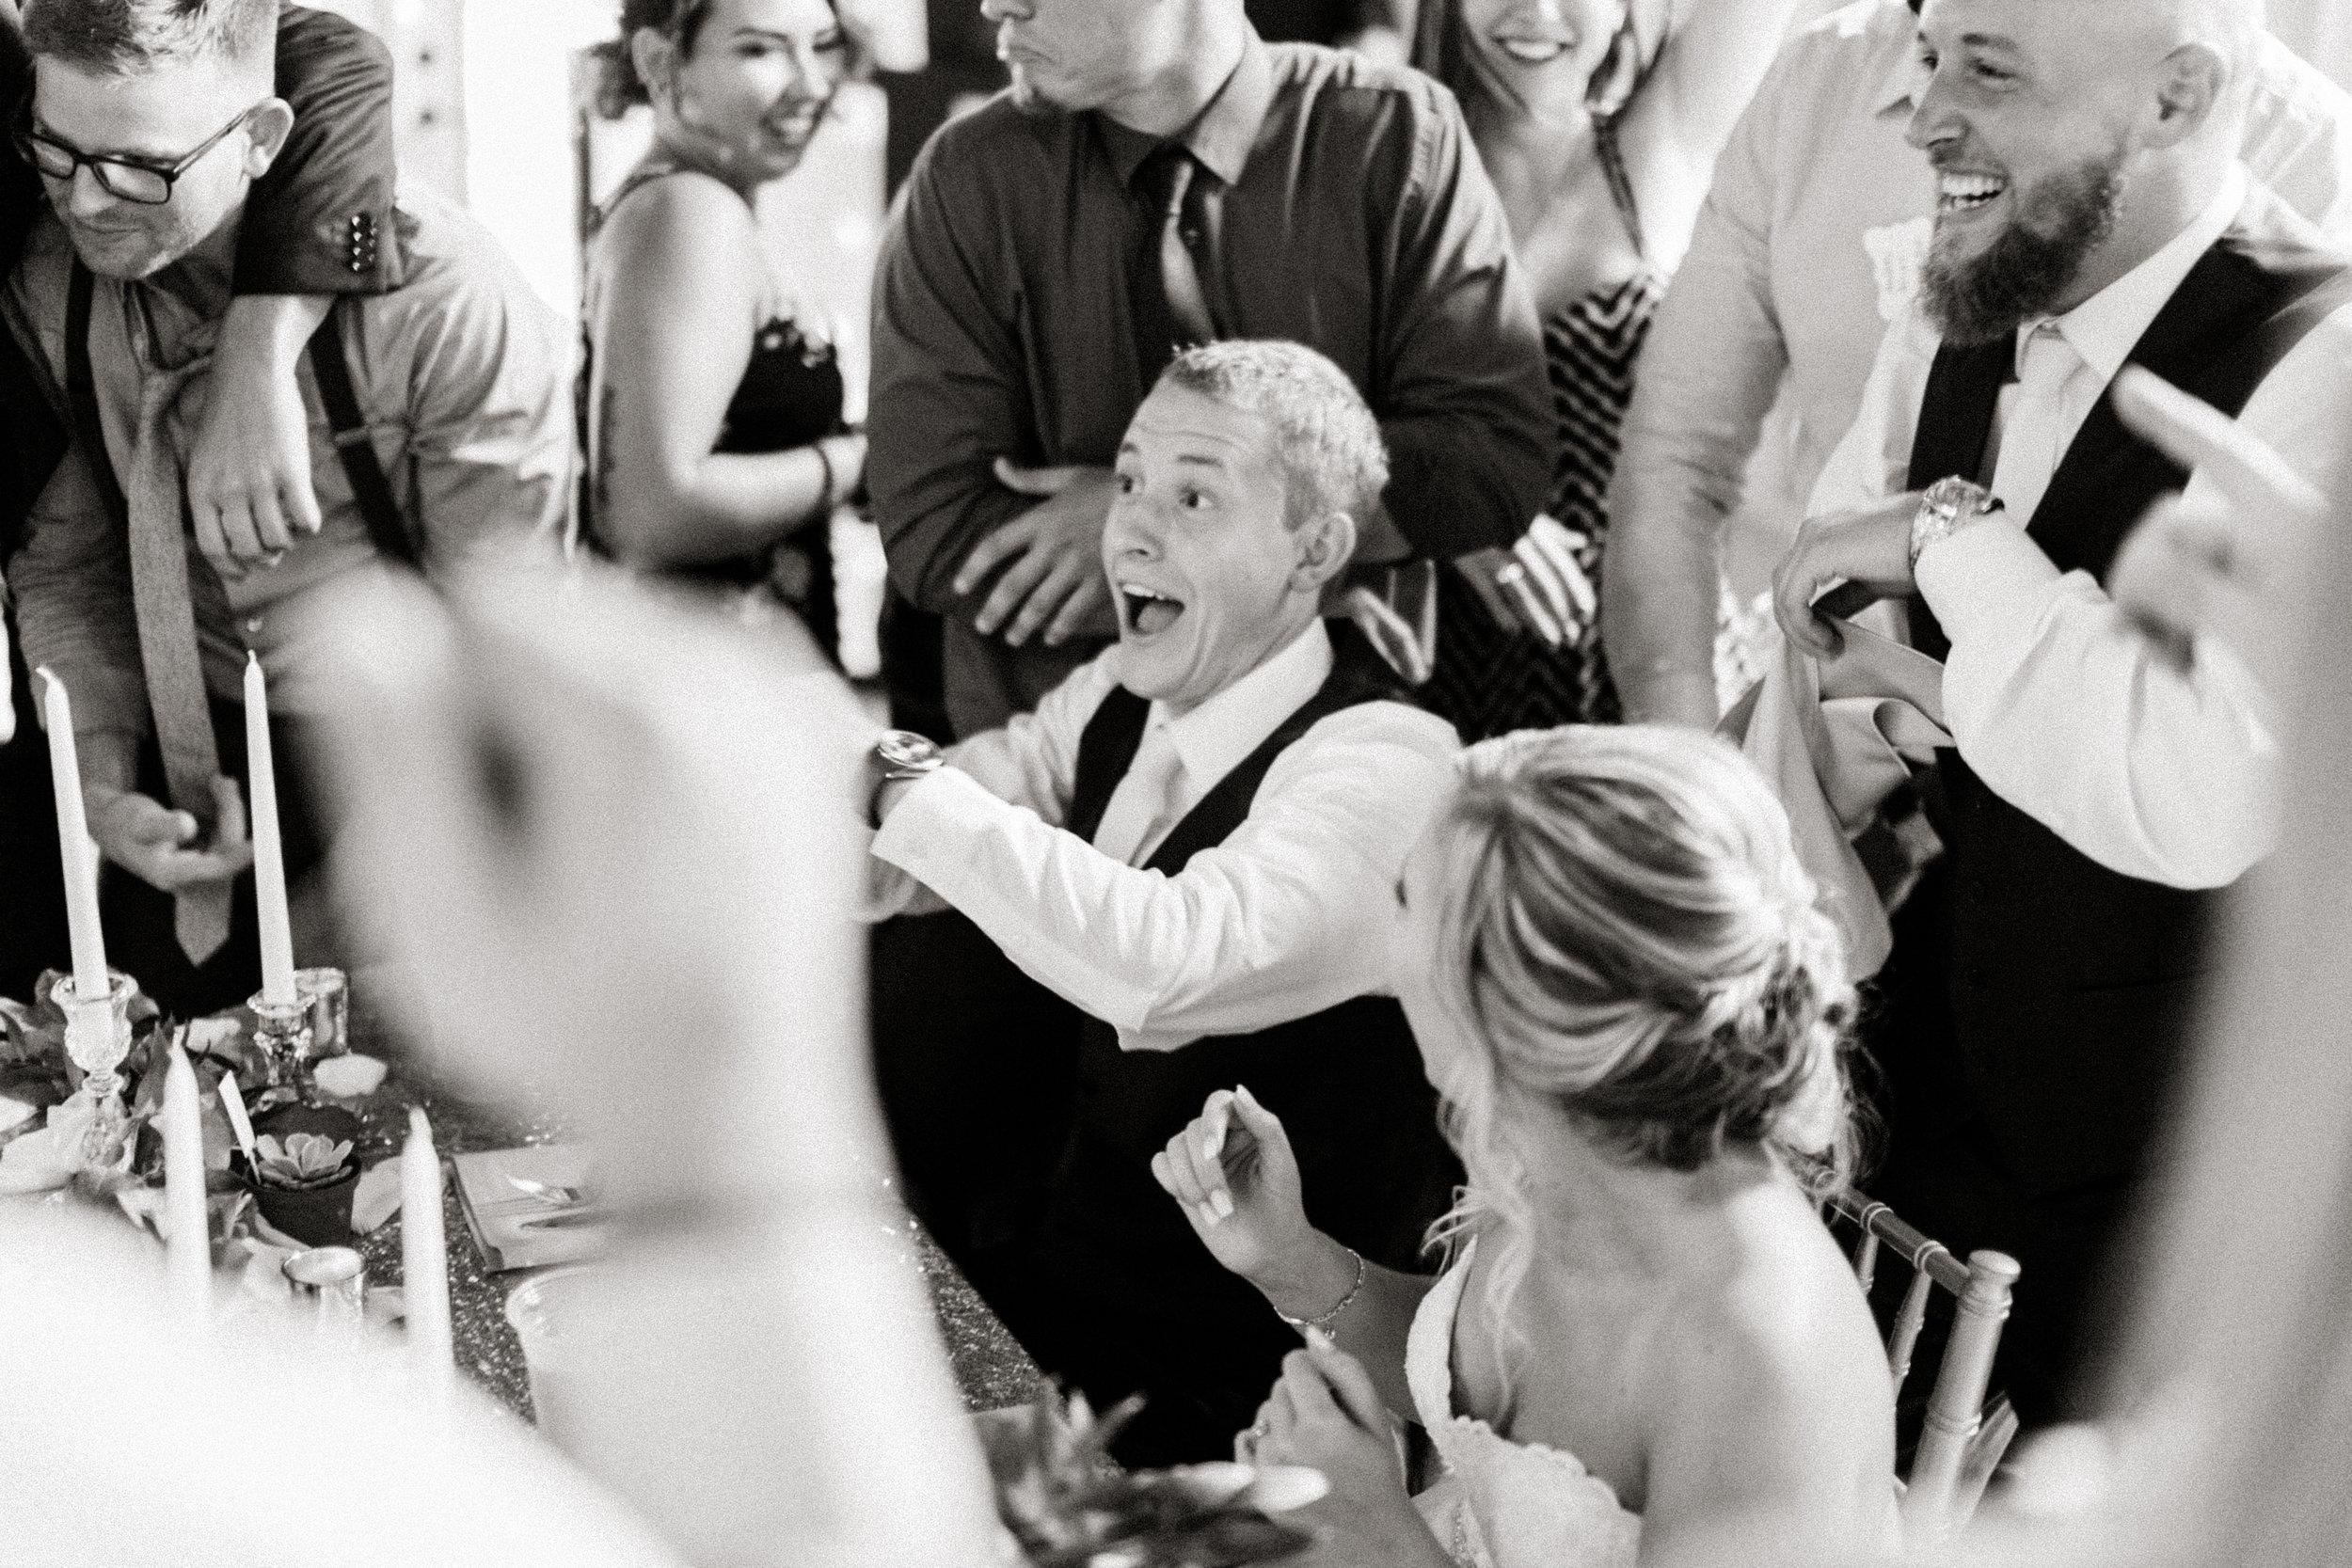 bw-the-mulberry-new-smyrna-beach-fl-wedding-photos-381.jpg